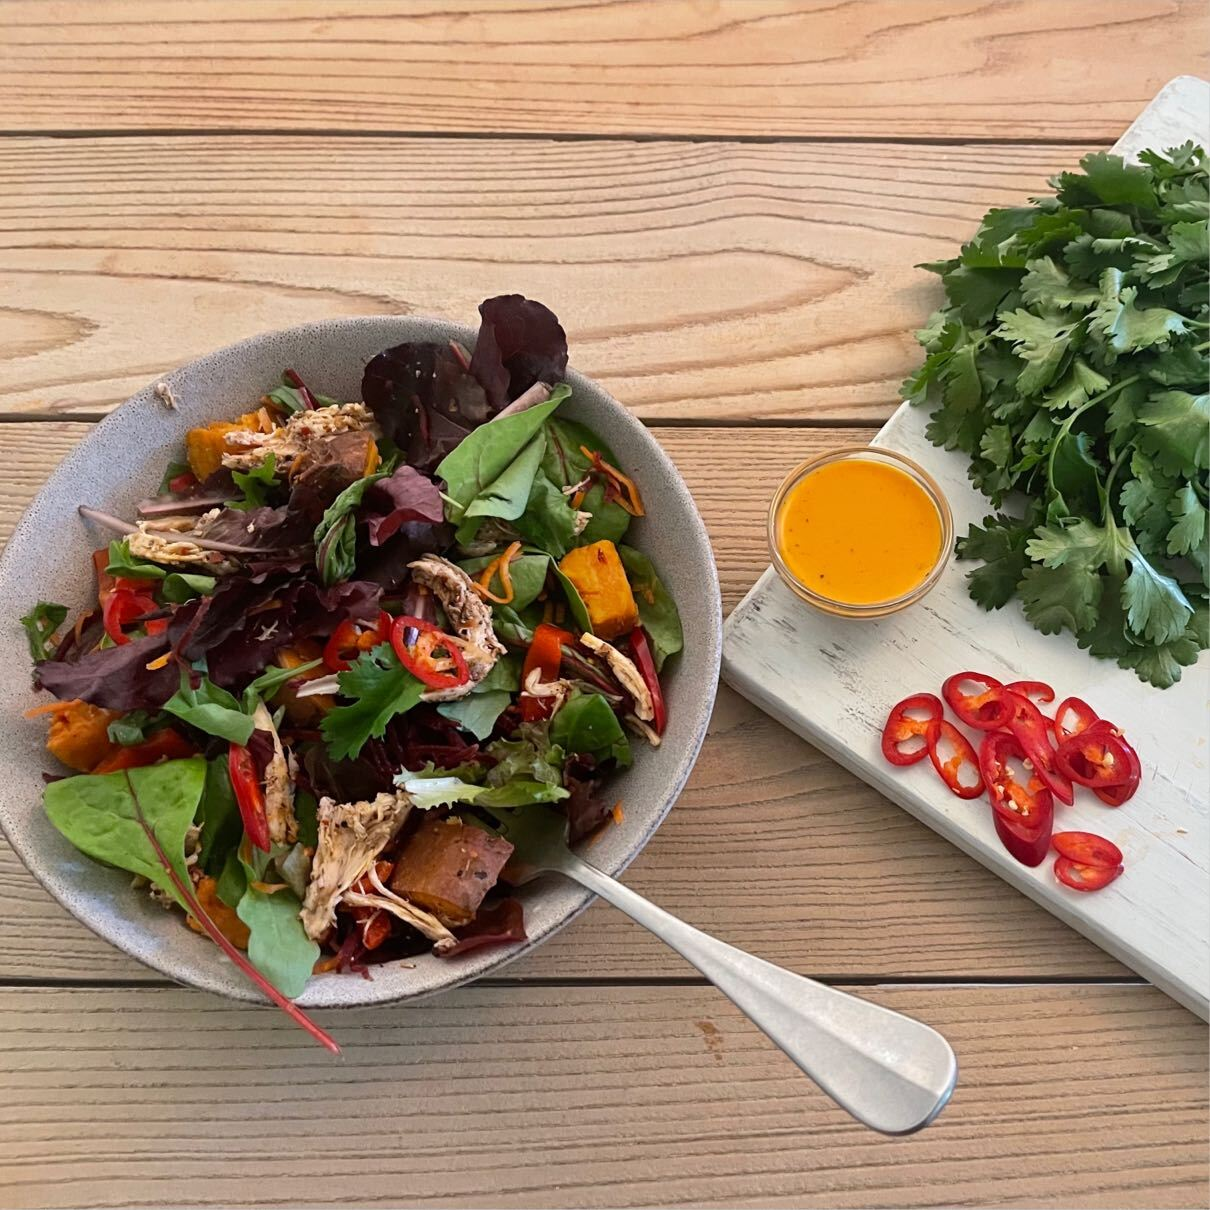 Fresh Chop'd salad